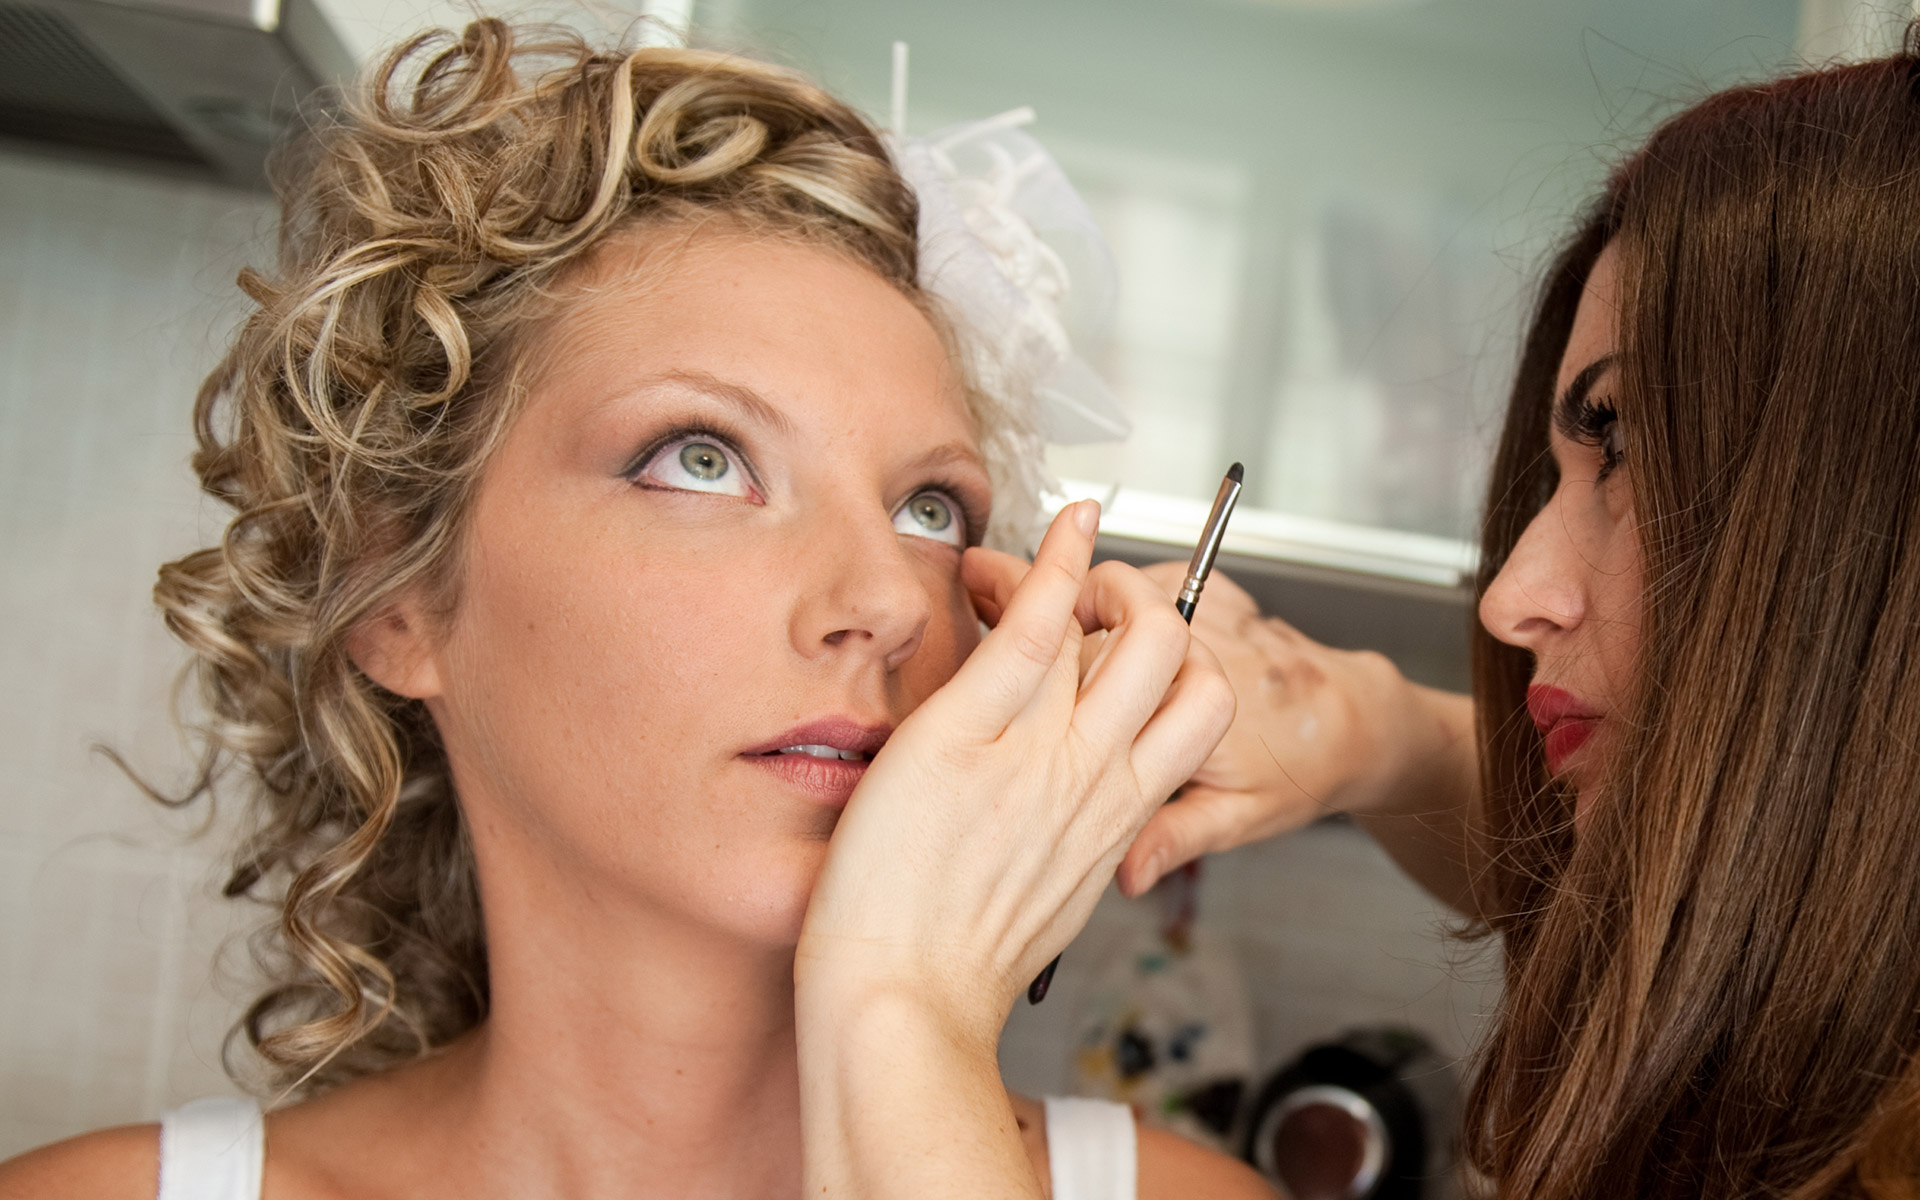 raffaella-make-up-style-home-2